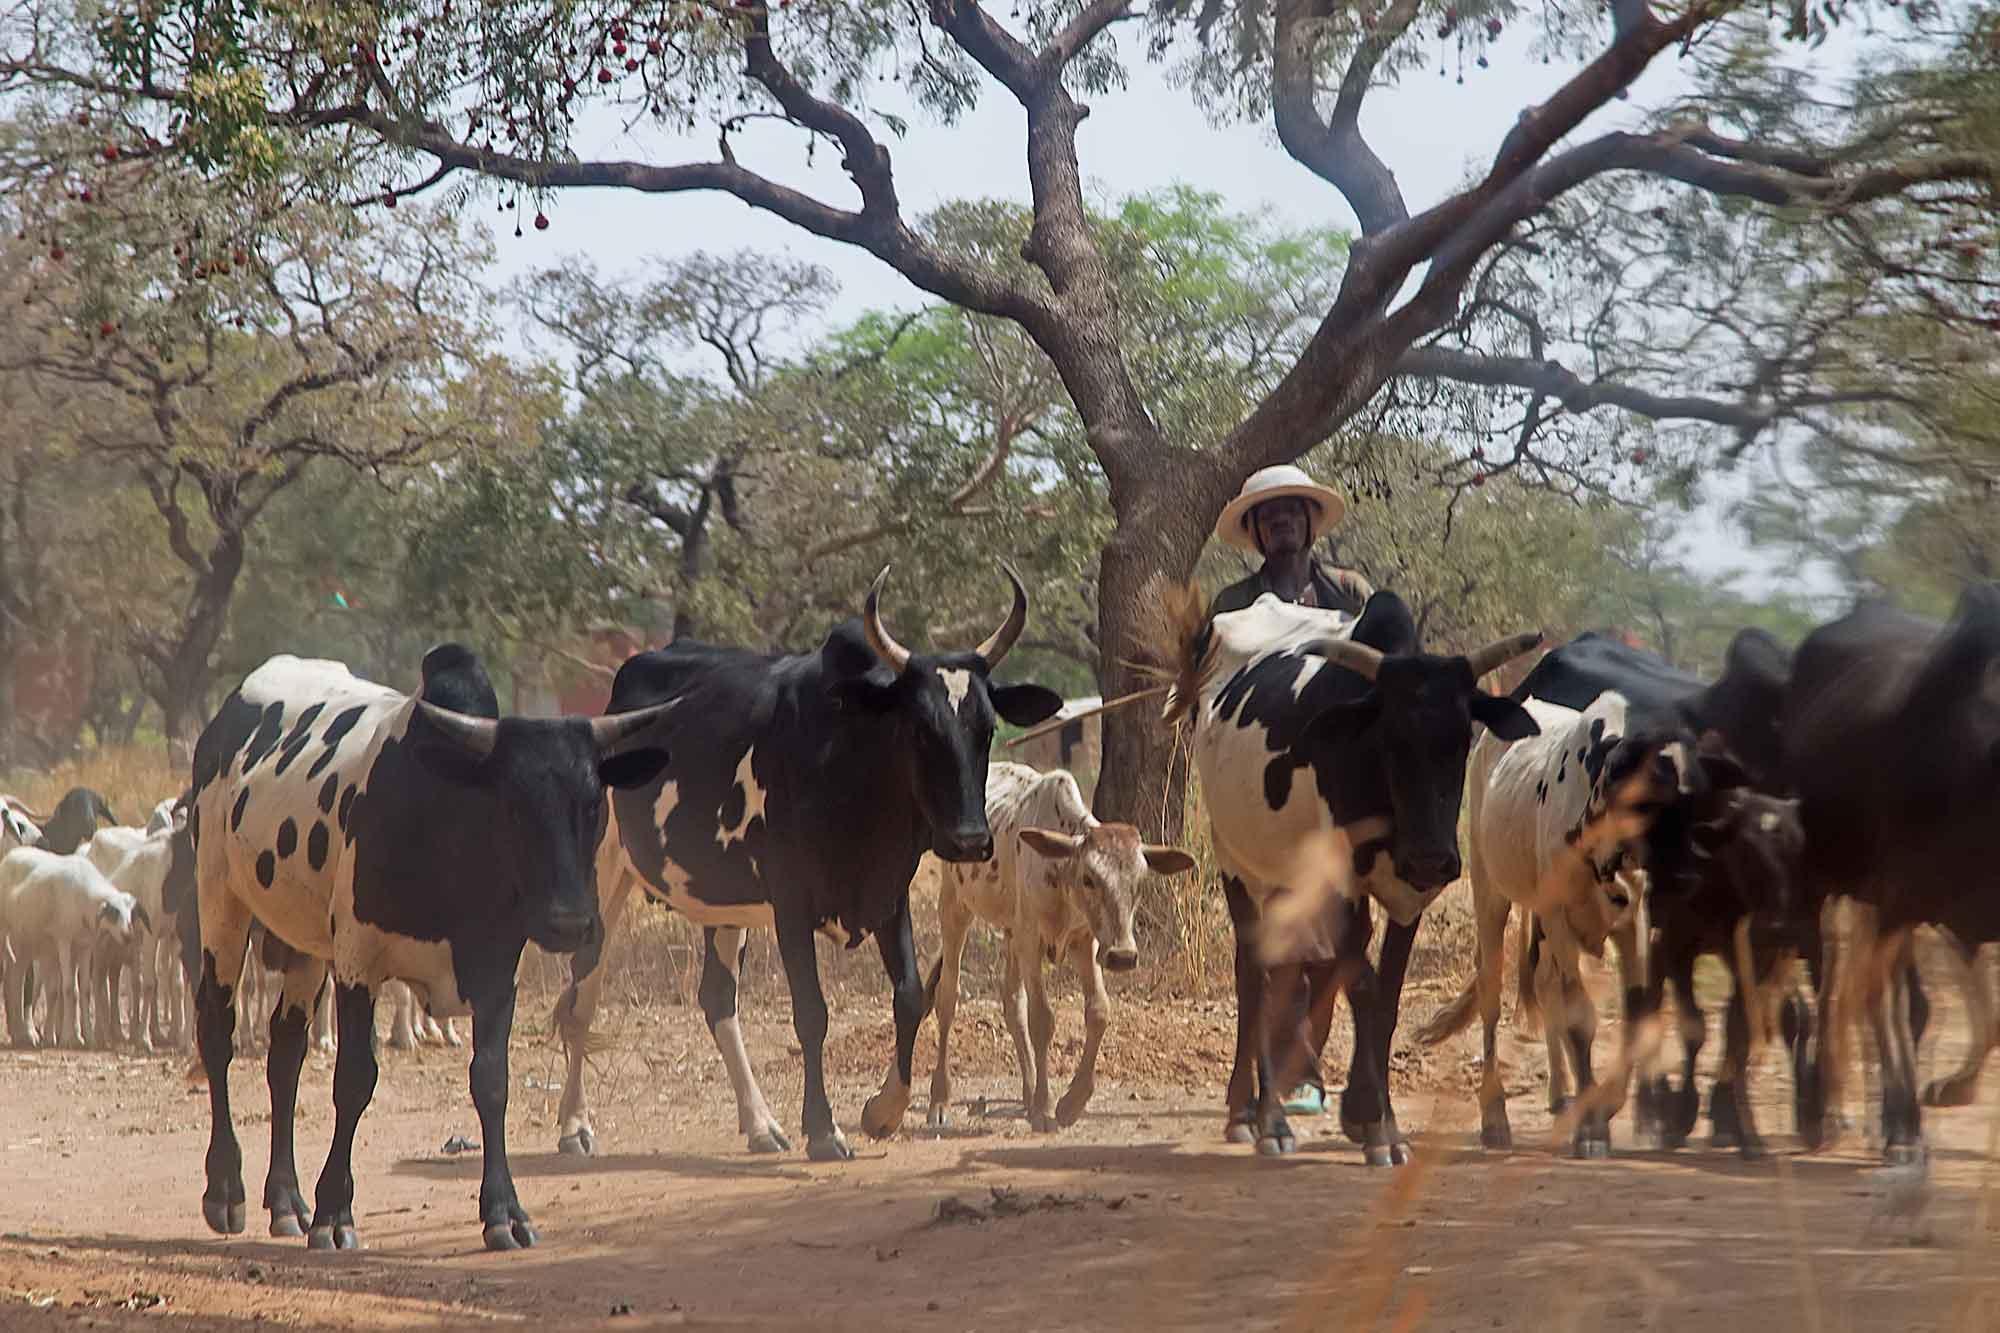 a-man-herding-his-cattle-banfora-burkina-faso-africa